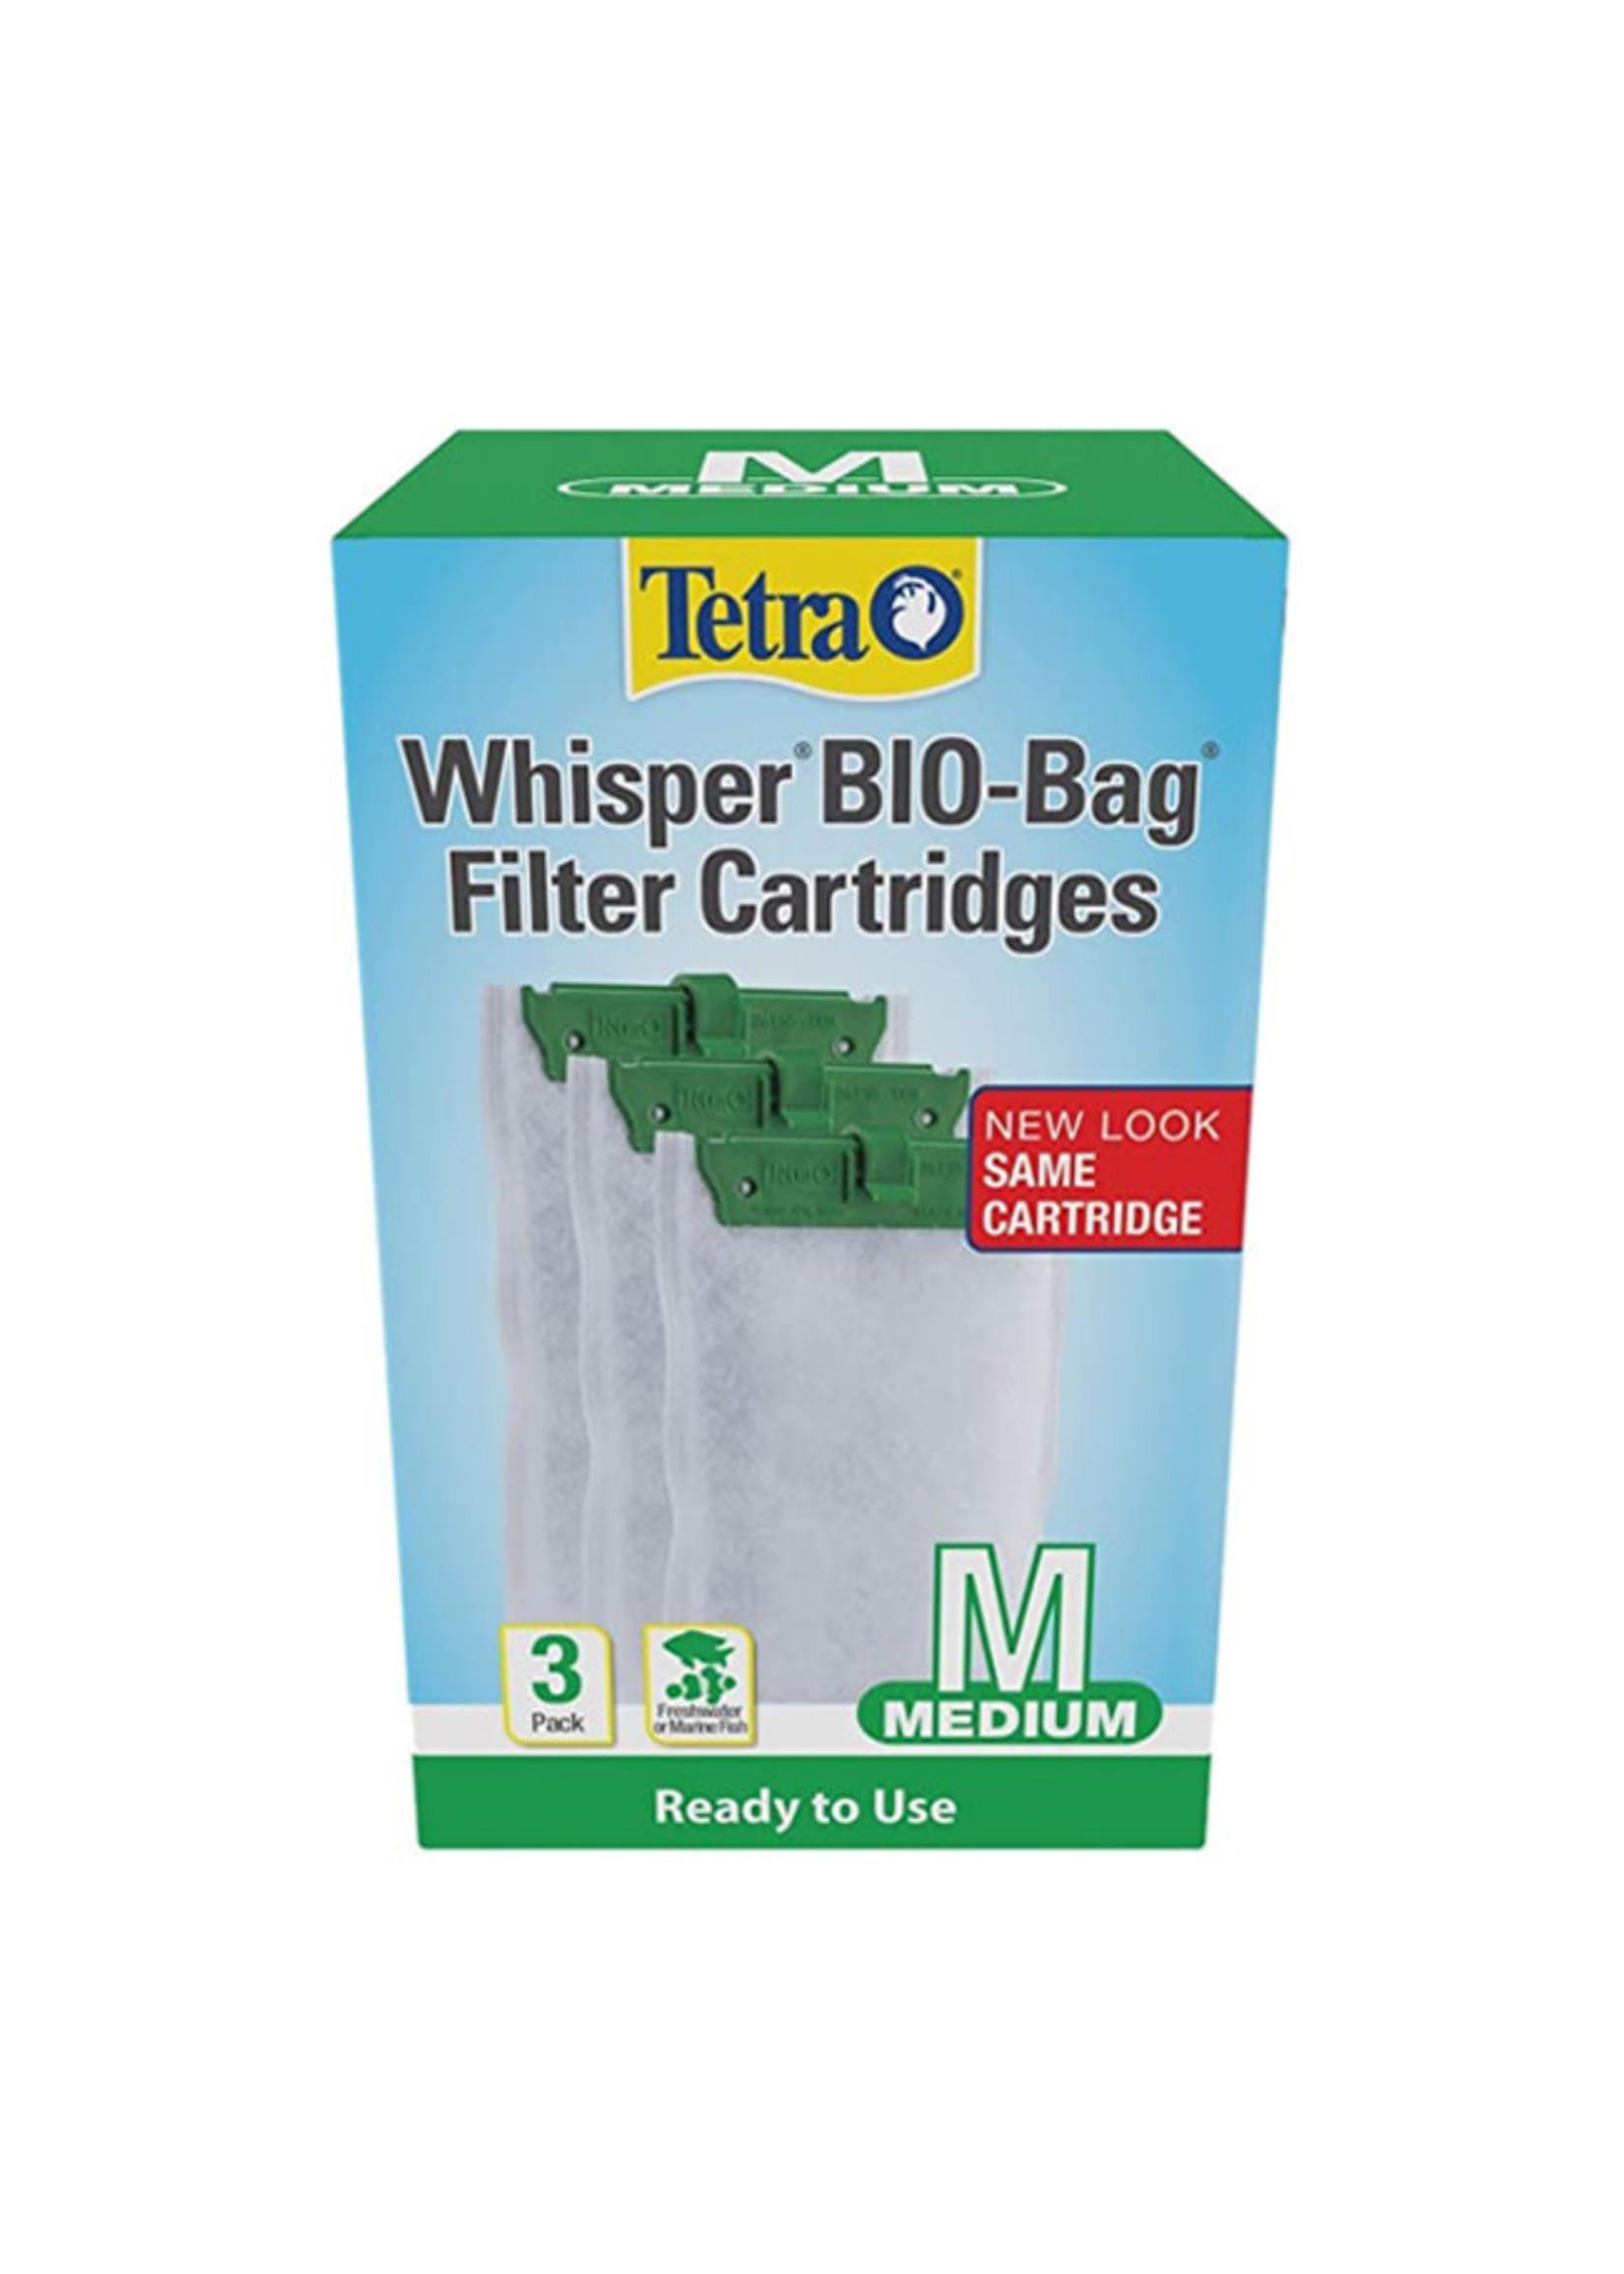 Tetra Tetra Whisper BIO-Bag  Filter Cartridges Ready to Use